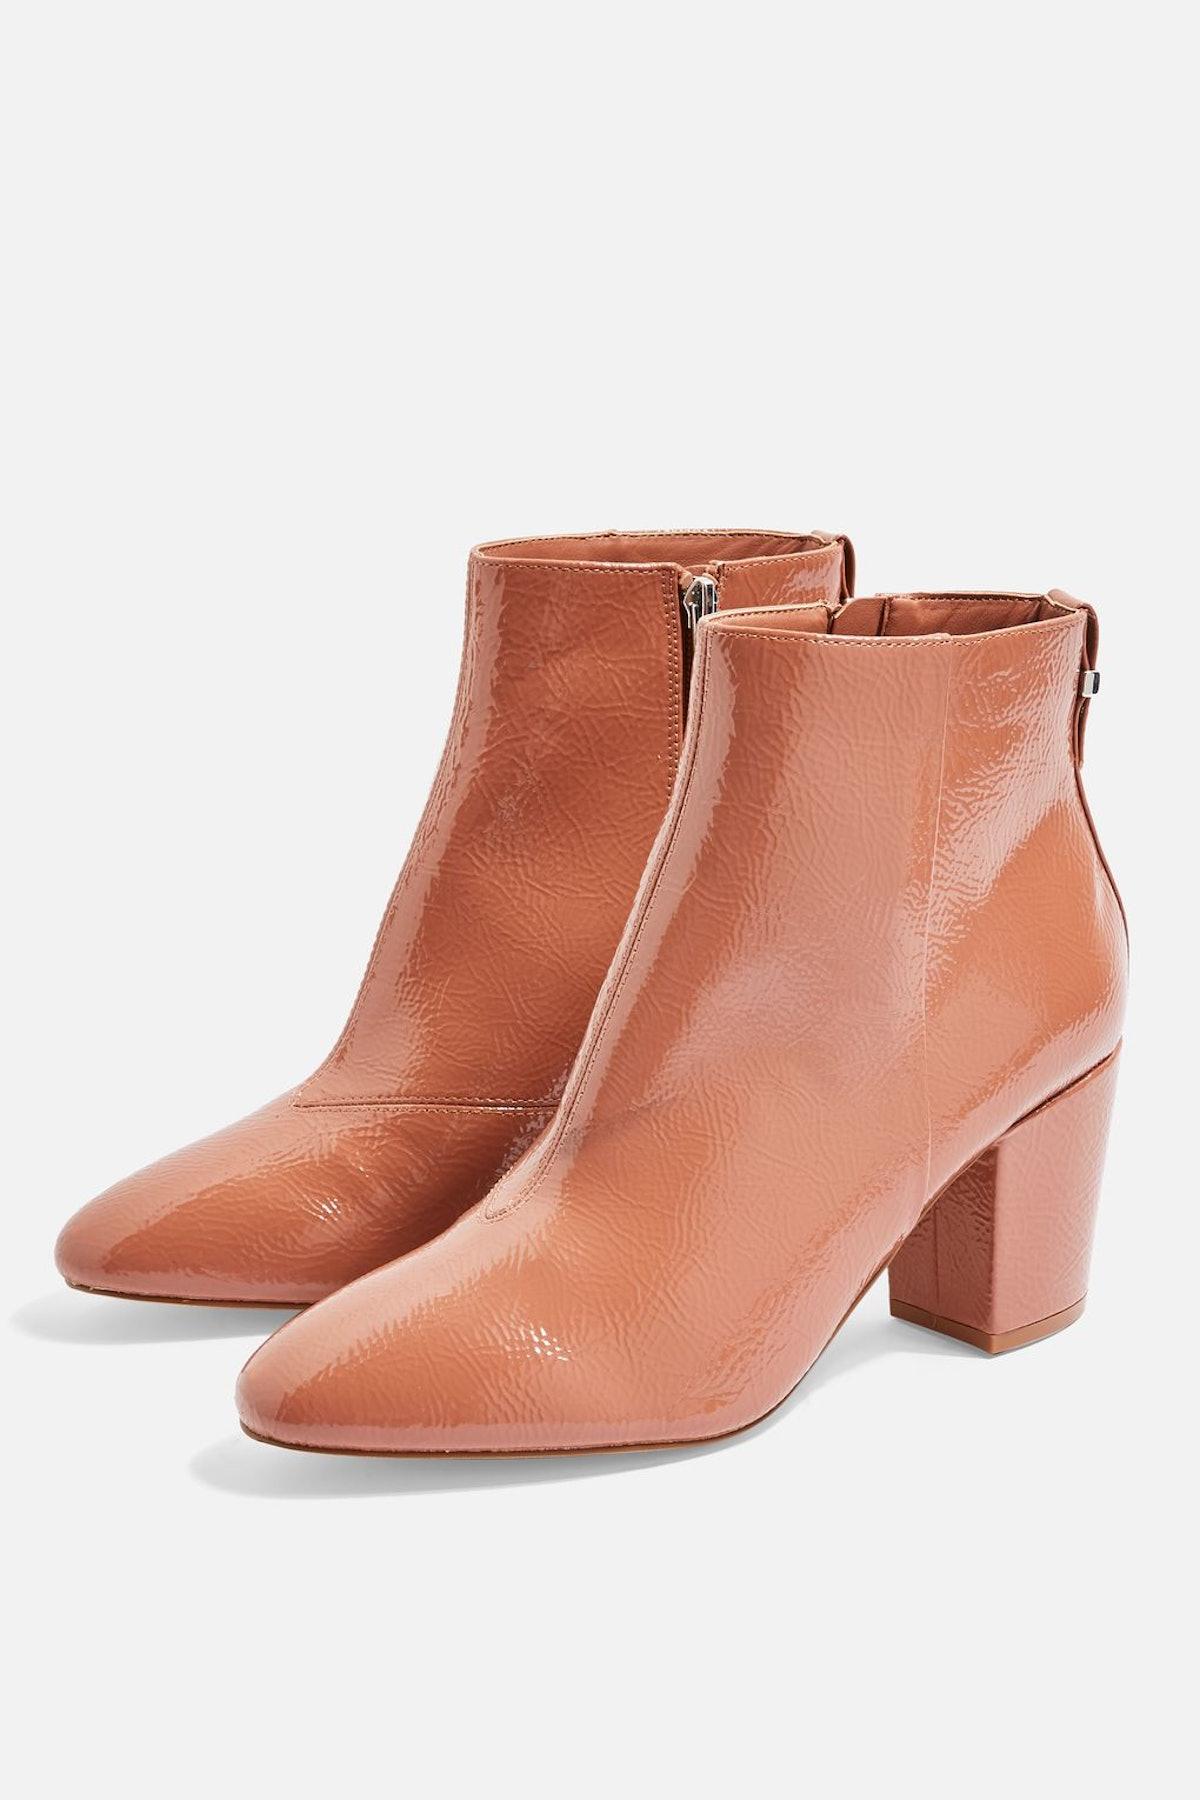 Brooklyn Block Boots